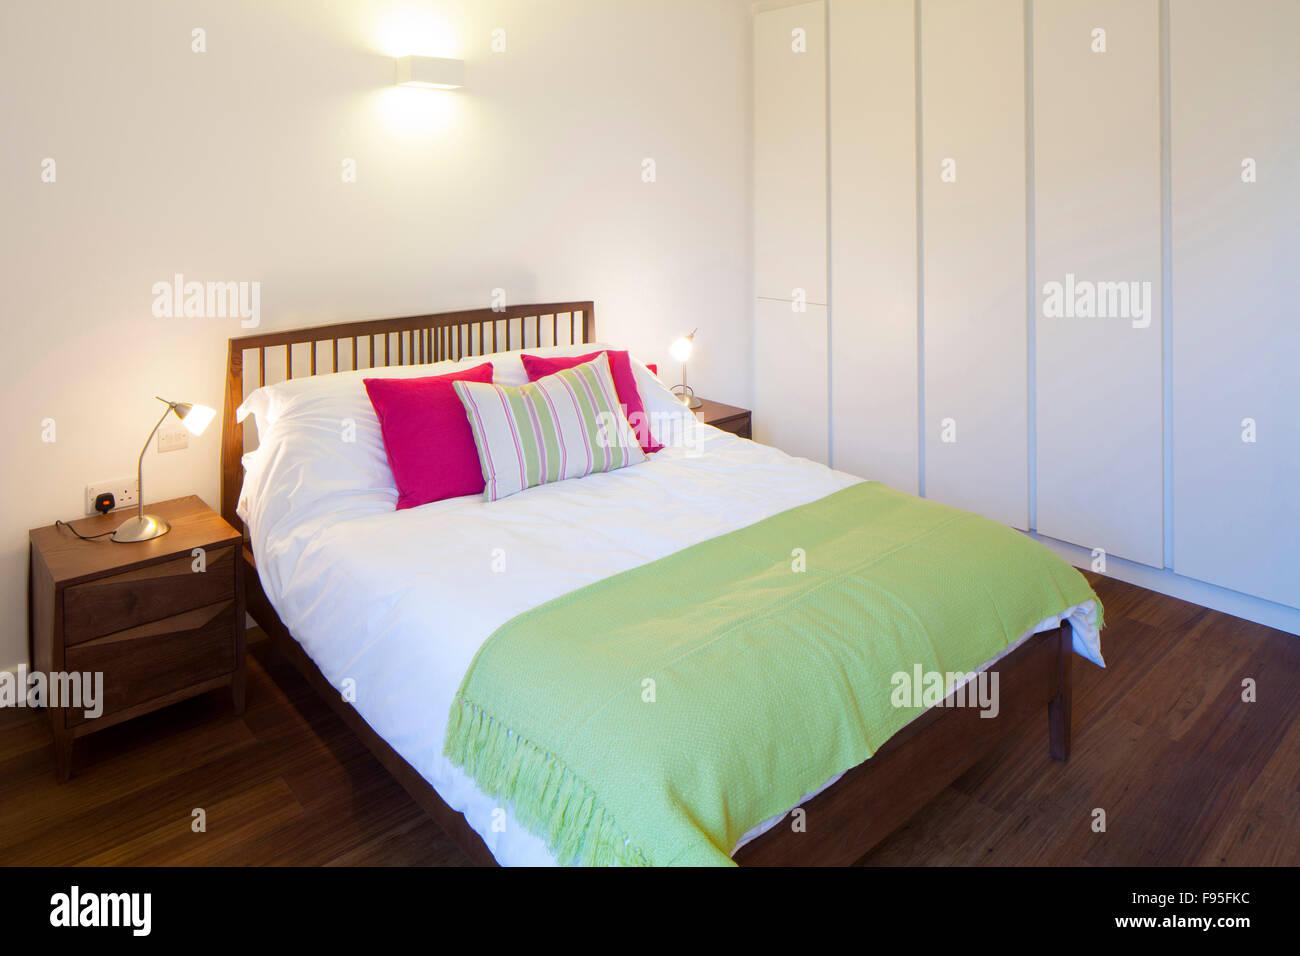 Uno Church Square, Londres, Reino Unido. Dormitorio con pisos de madera en un apartamento moderno. Imagen De Stock